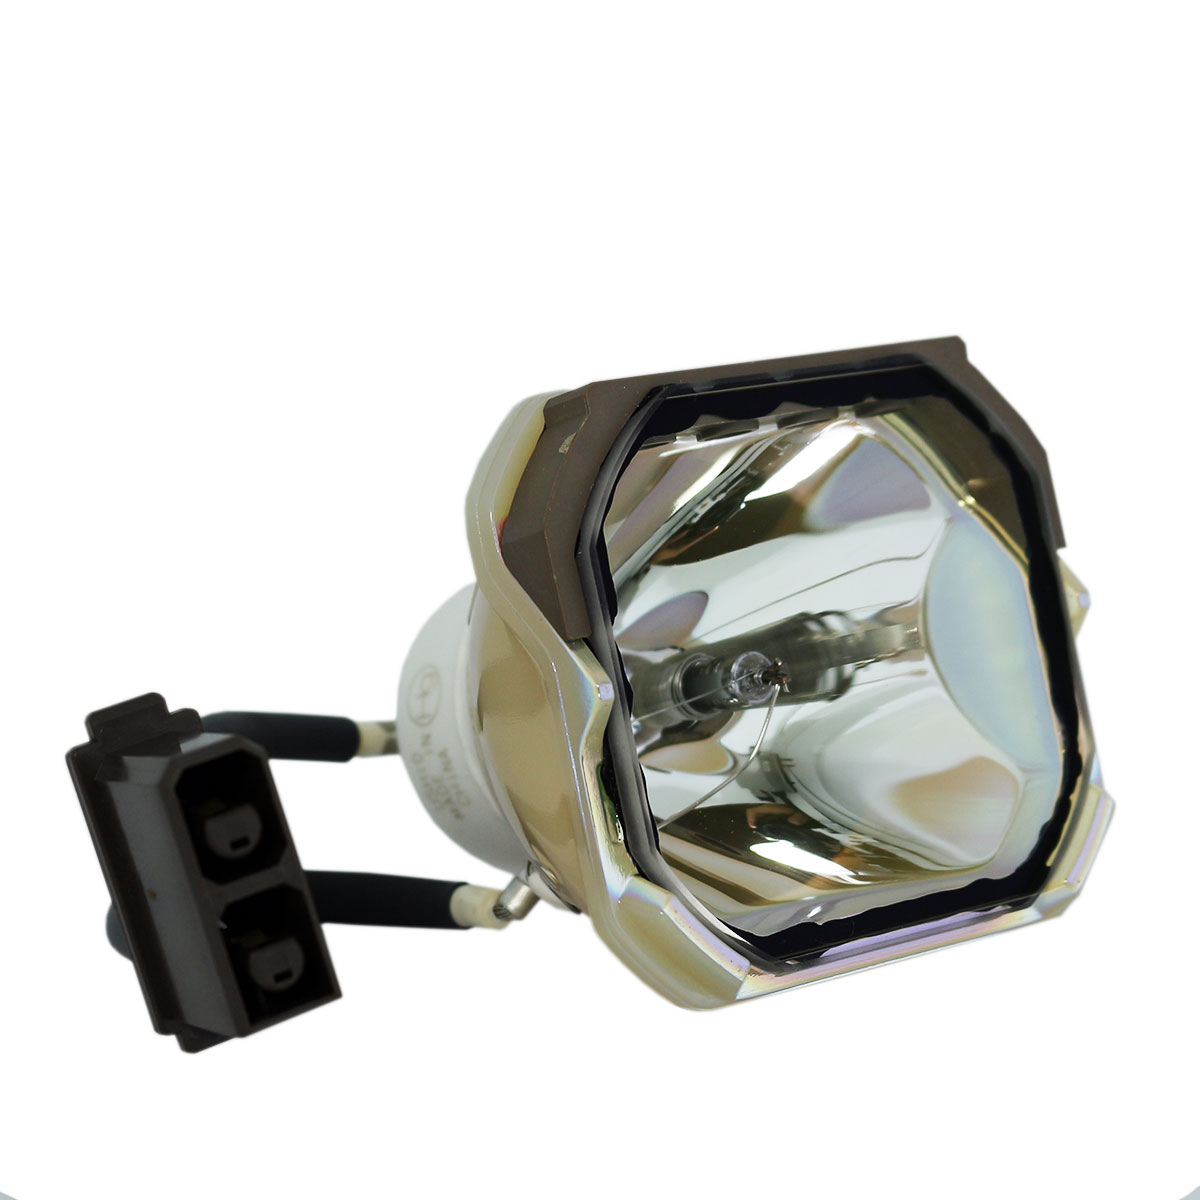 Ushio Lamp 017 Original Replacement Bulb For Ask Proxima Dp6850 Projector Lamp Ebay